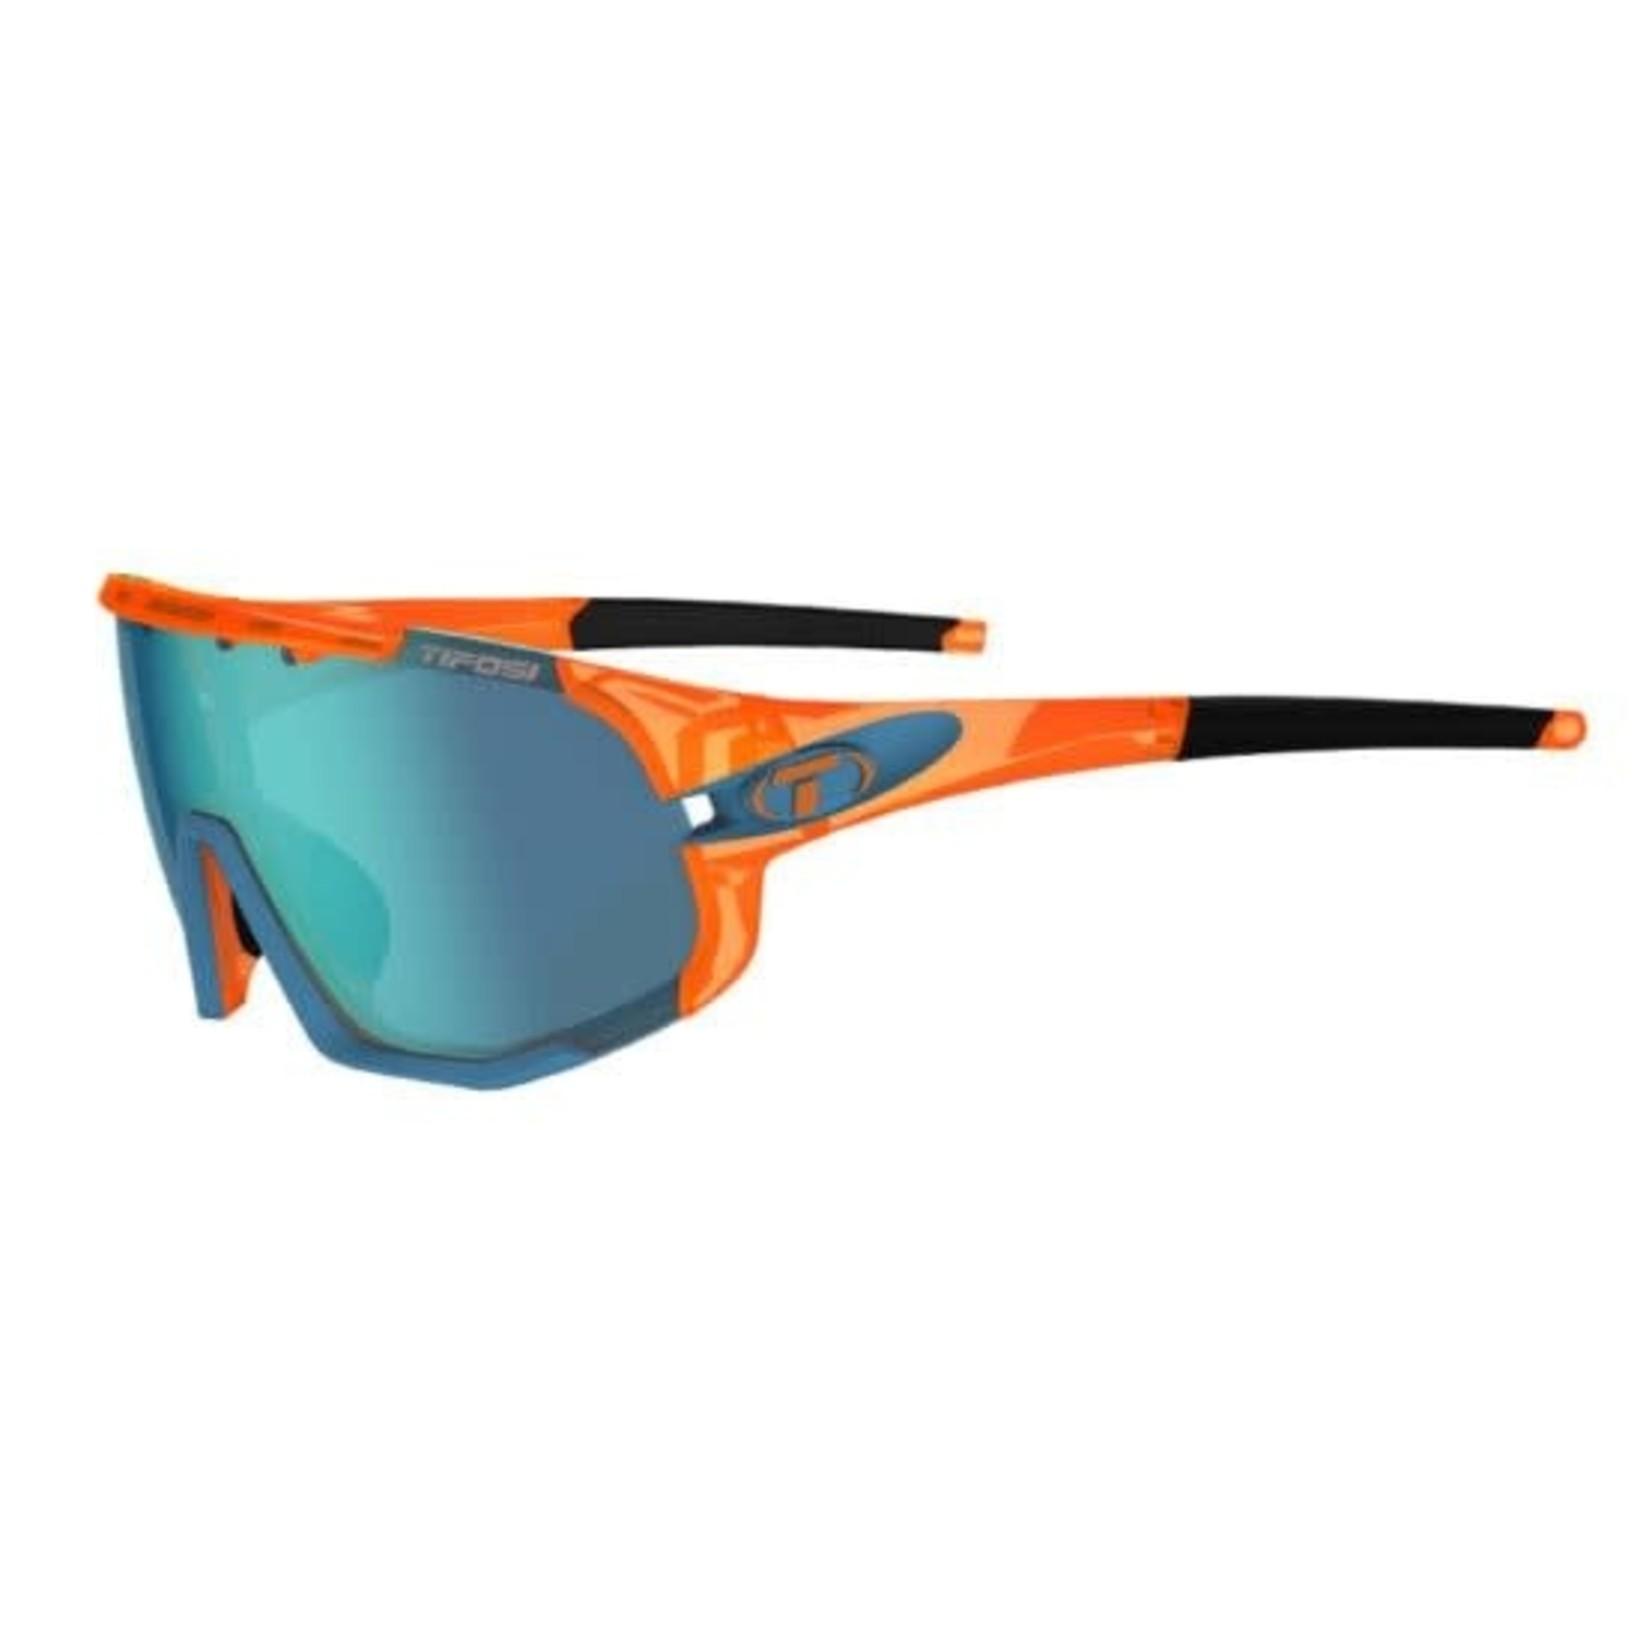 Tifosi Optics Sledge, Crystal Orange Interchangeable Sunglasses